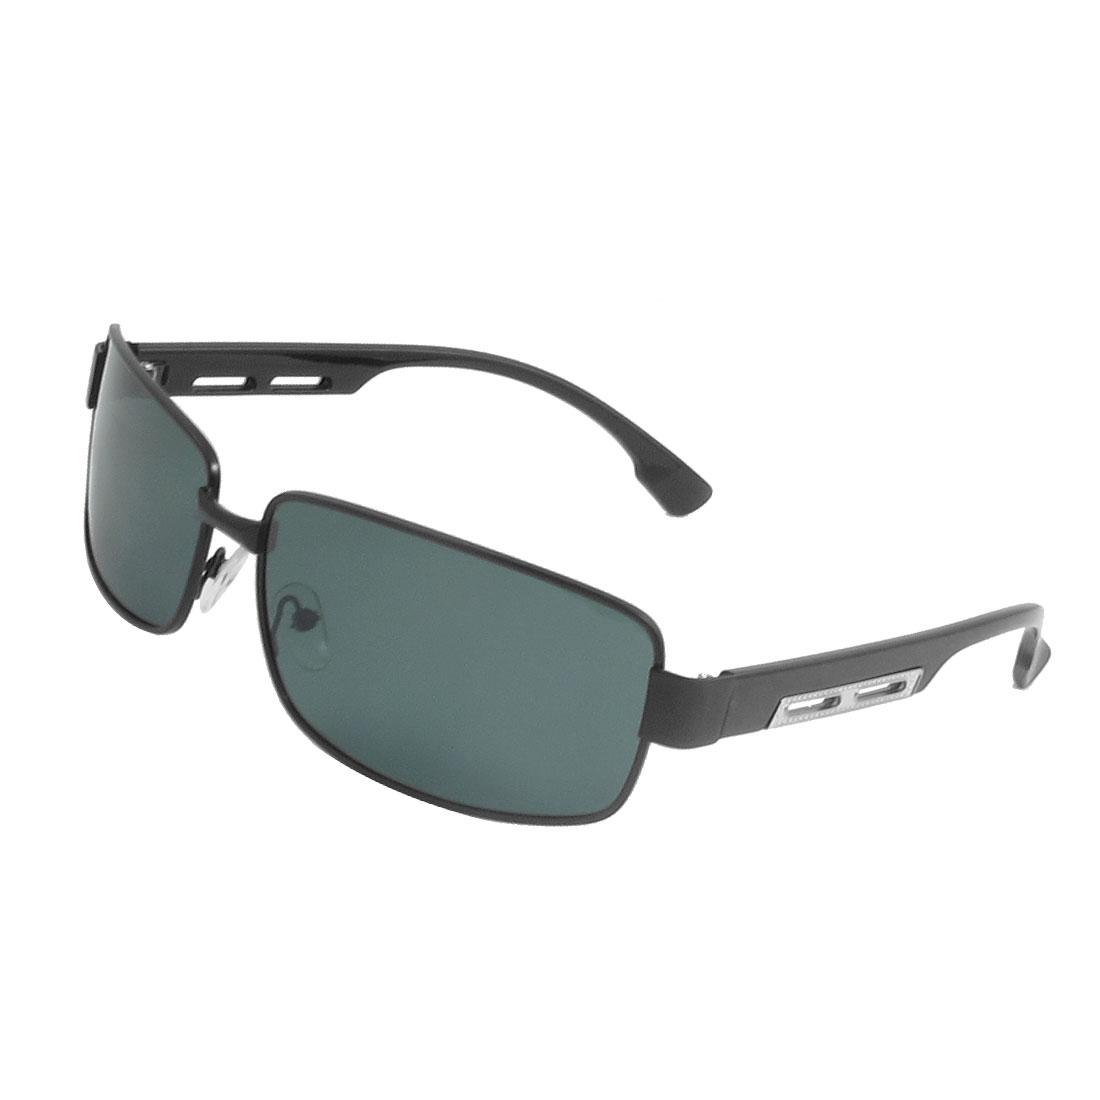 Men Black Full Rim Metal Decor Plastic Arms Polarized Sunglasses